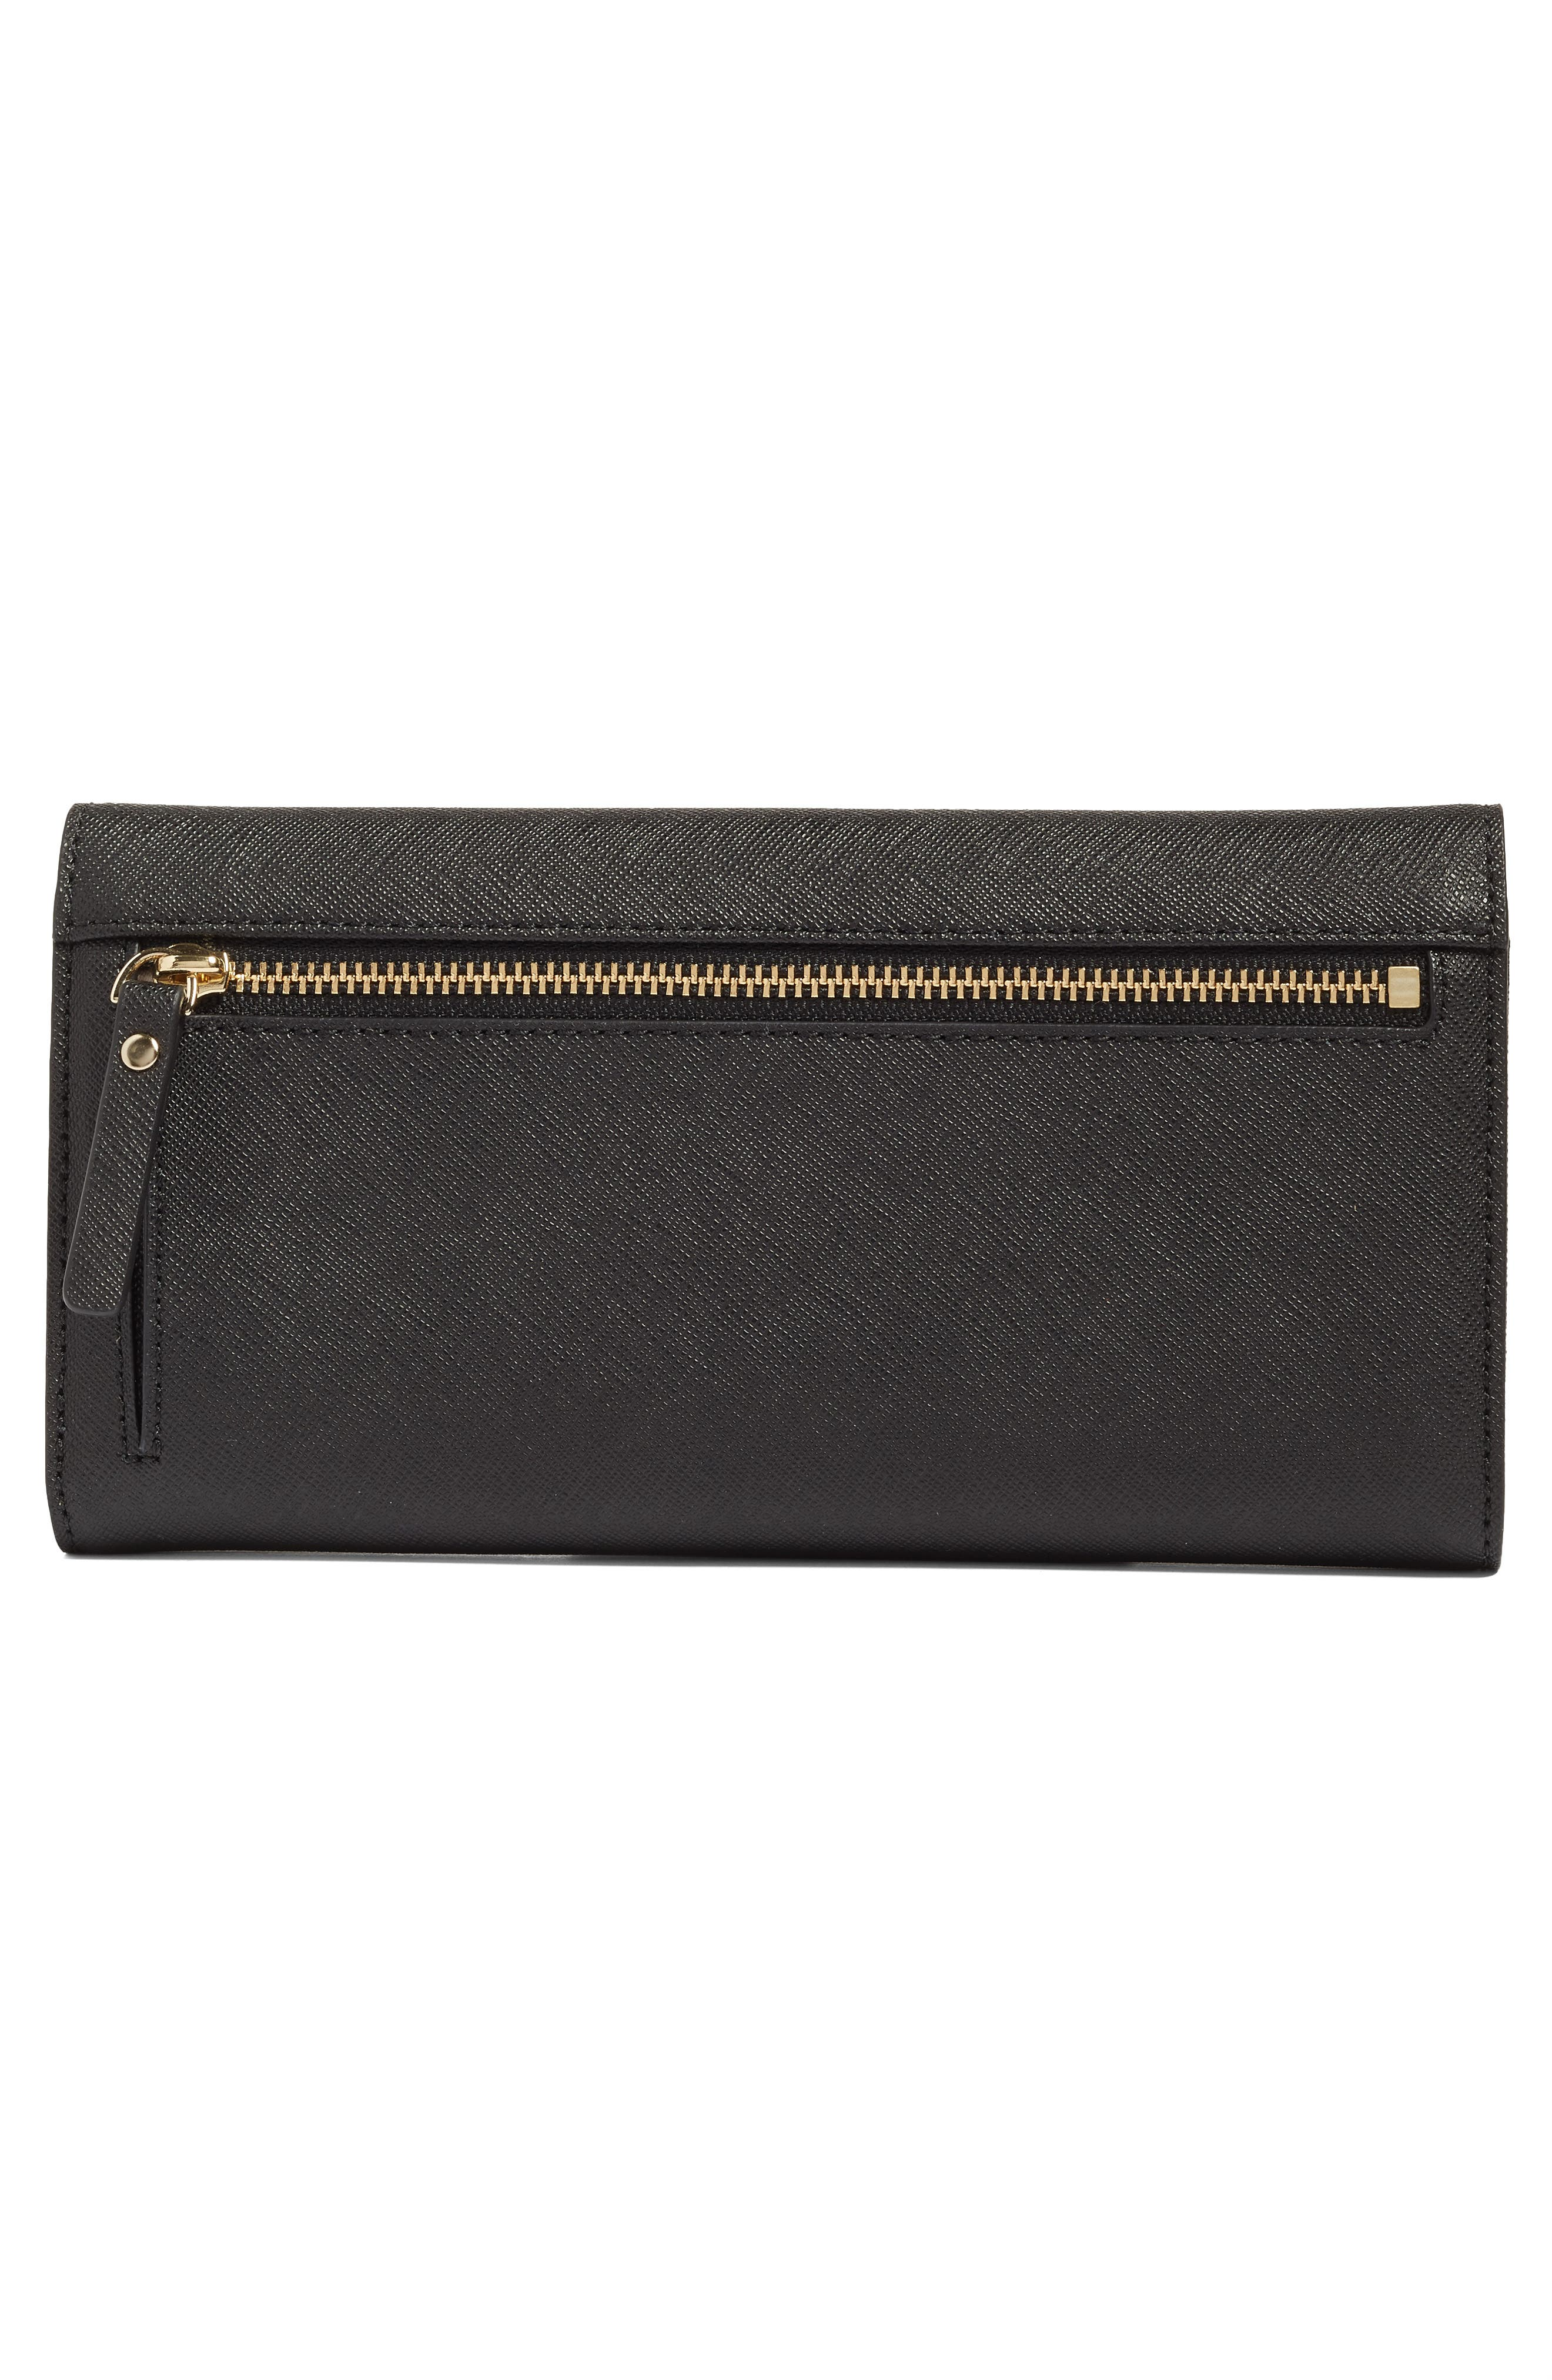 Alternate Image 3  - kate spade new york leather iPhone 7 & 7 Plus wallet